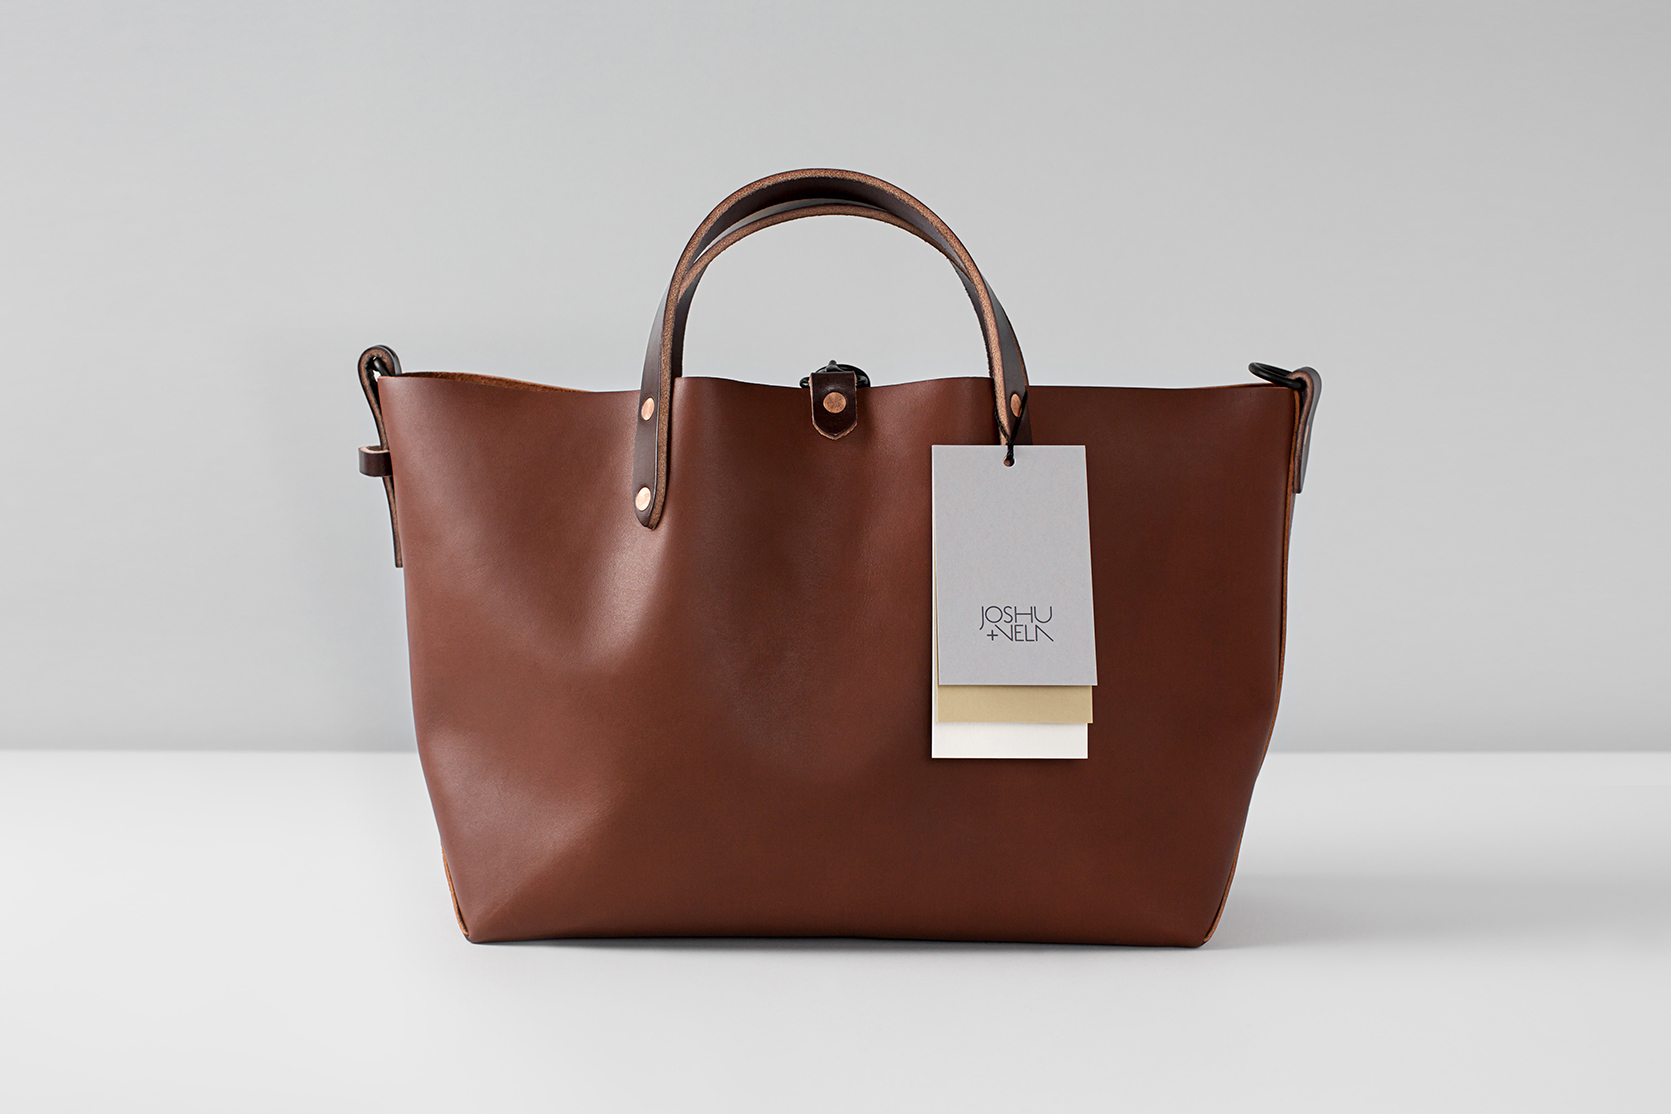 Julia-Kostreva-Studio-Branding-Joshu-Vela--Letterpress-Hangtags-Tote-Leather-1b.jpg